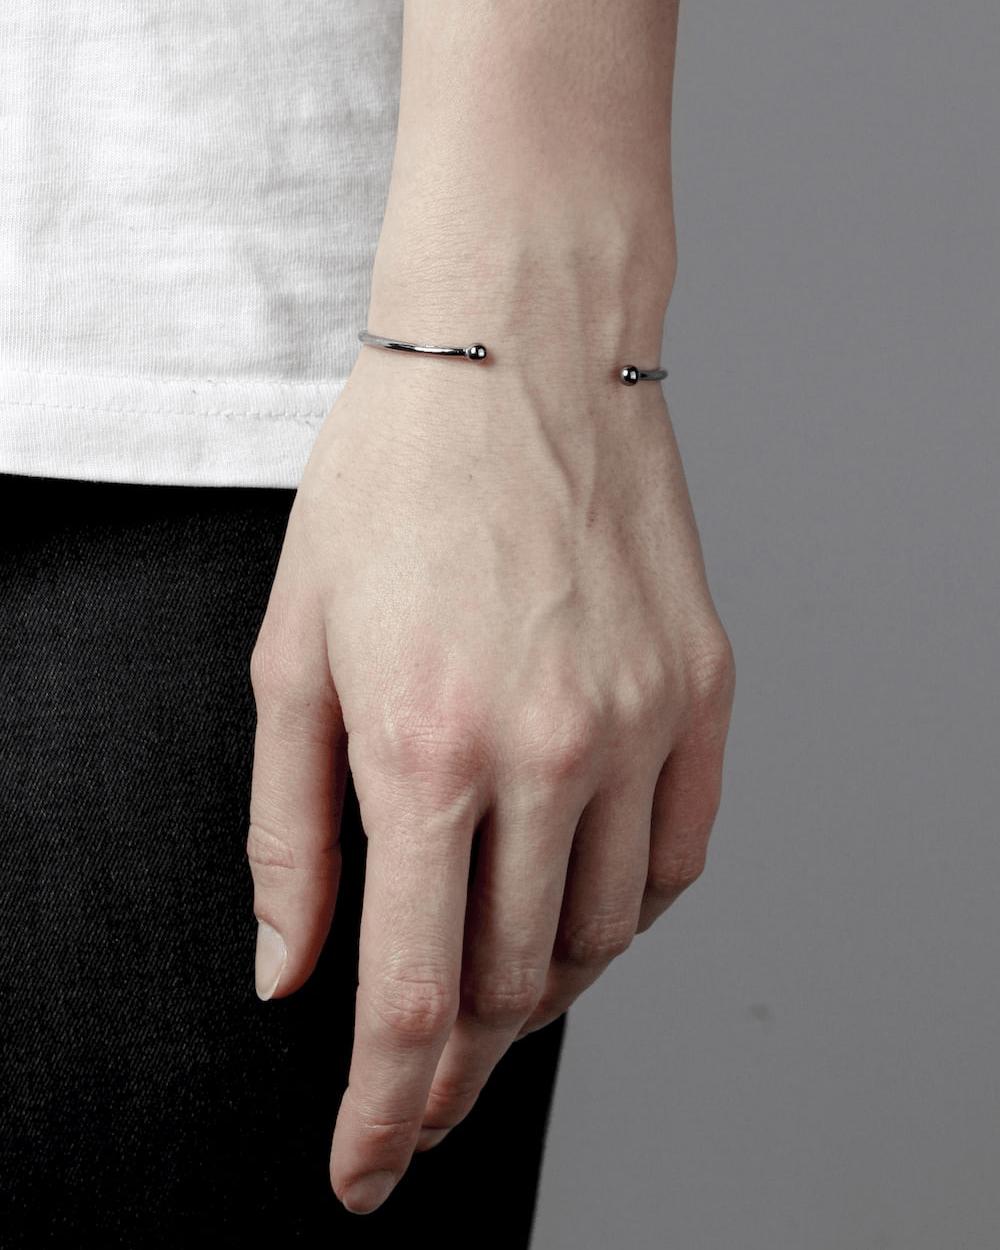 Bracelets RUTHENIUM SPHERES SMALL PIERCING BRACELET NOVE25